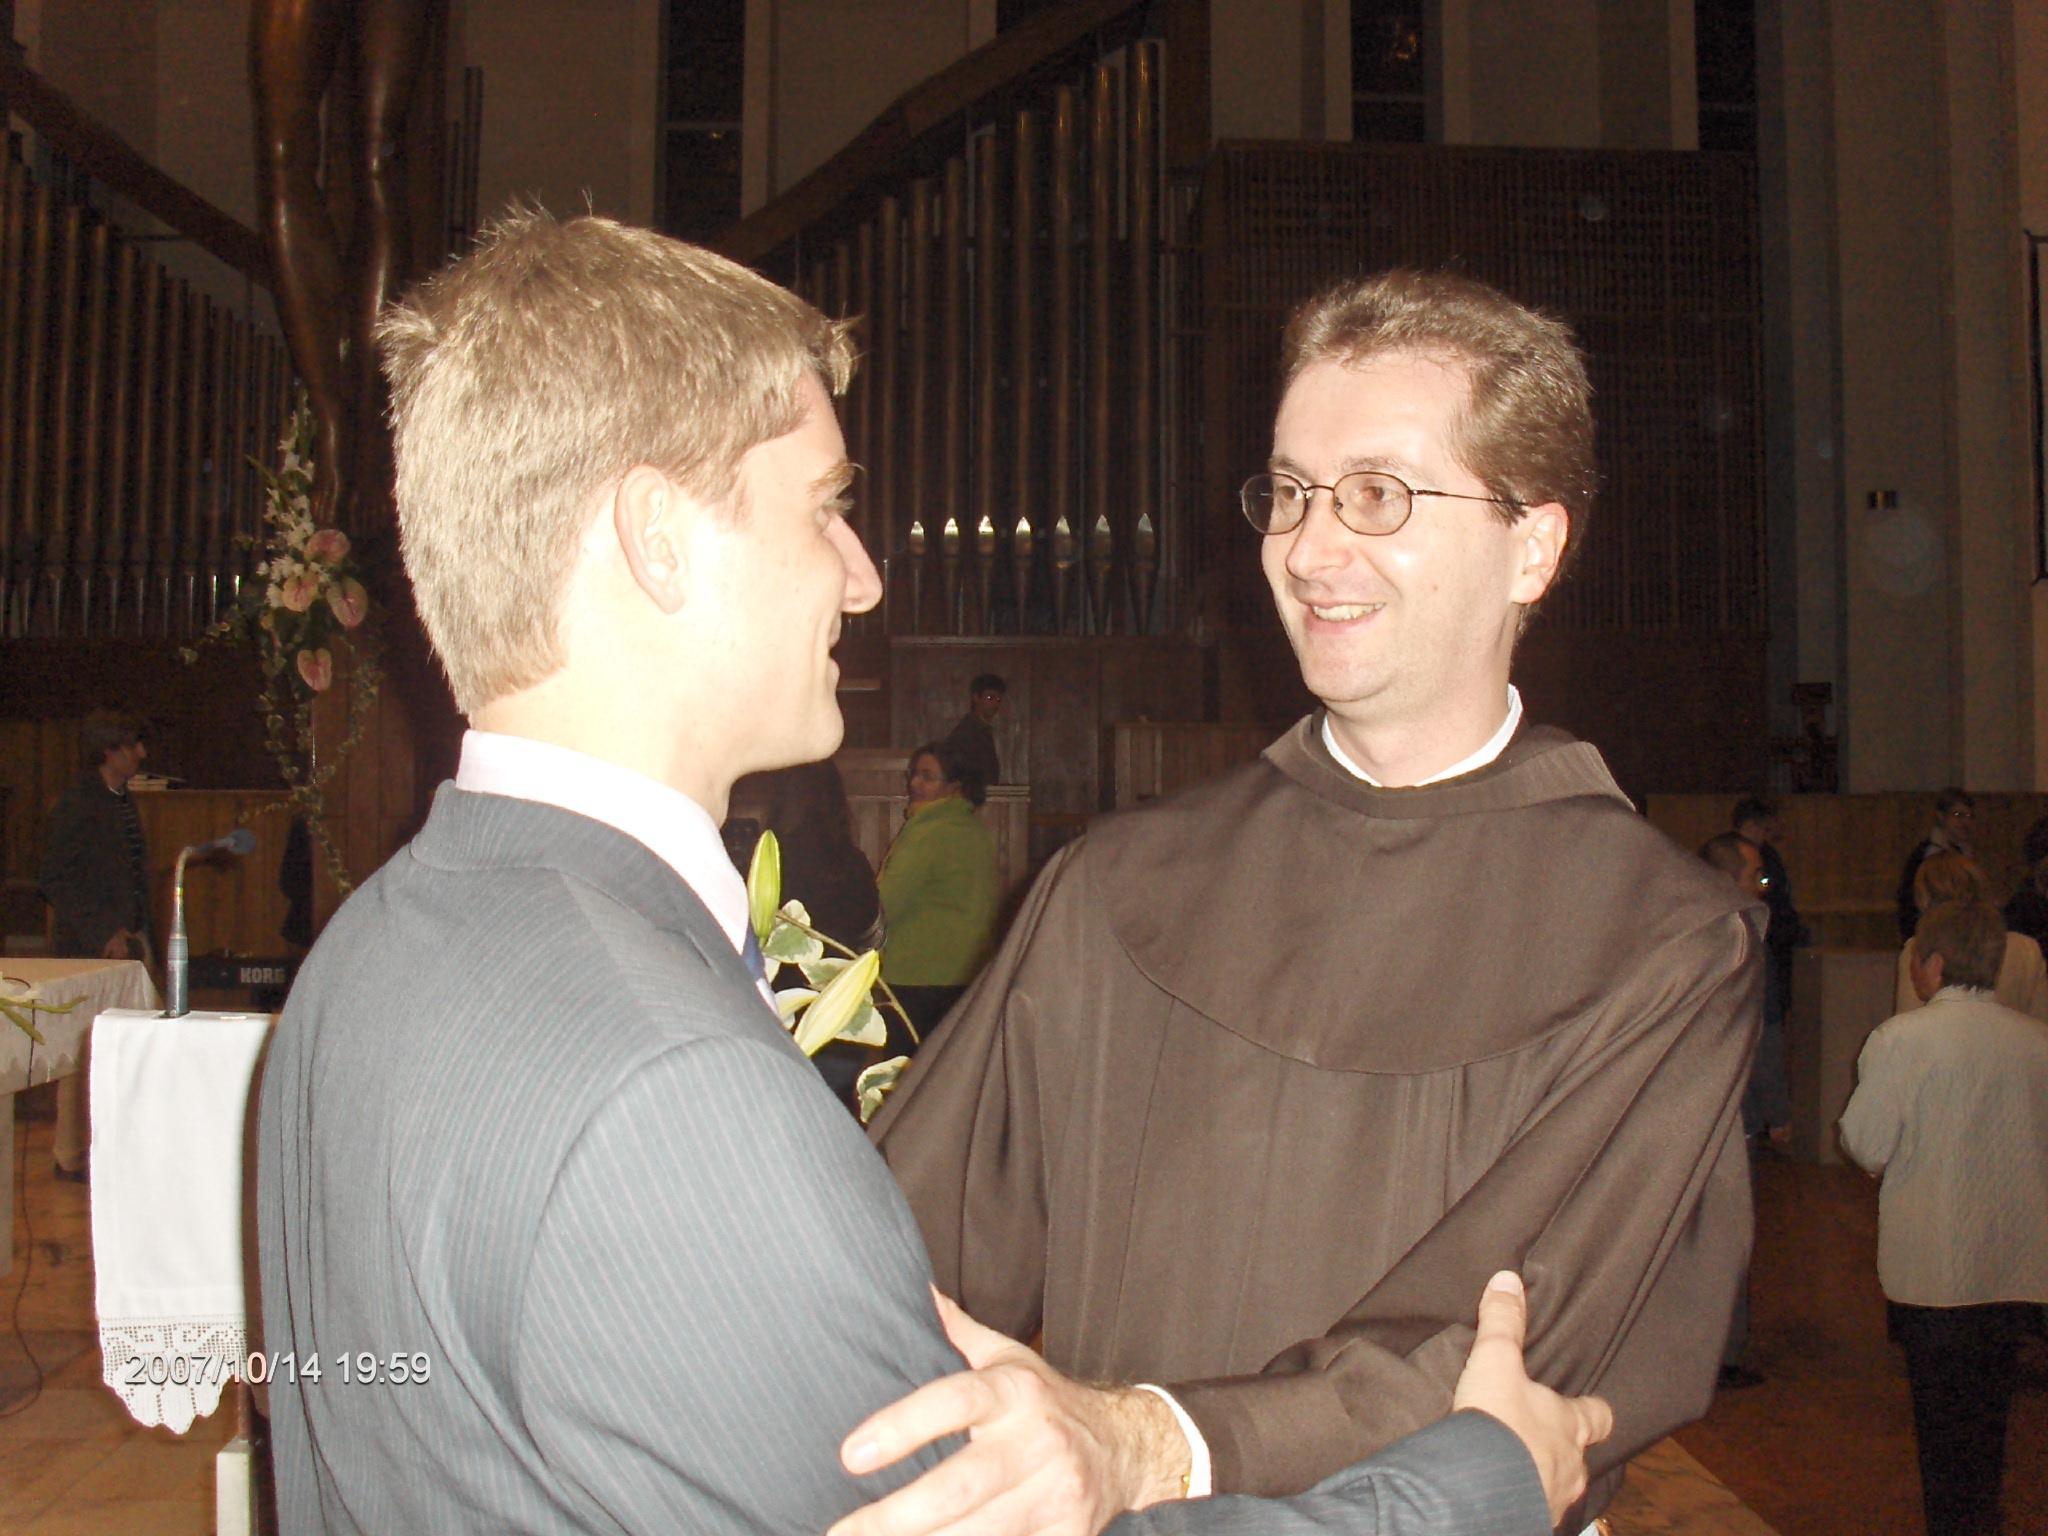 2007 486